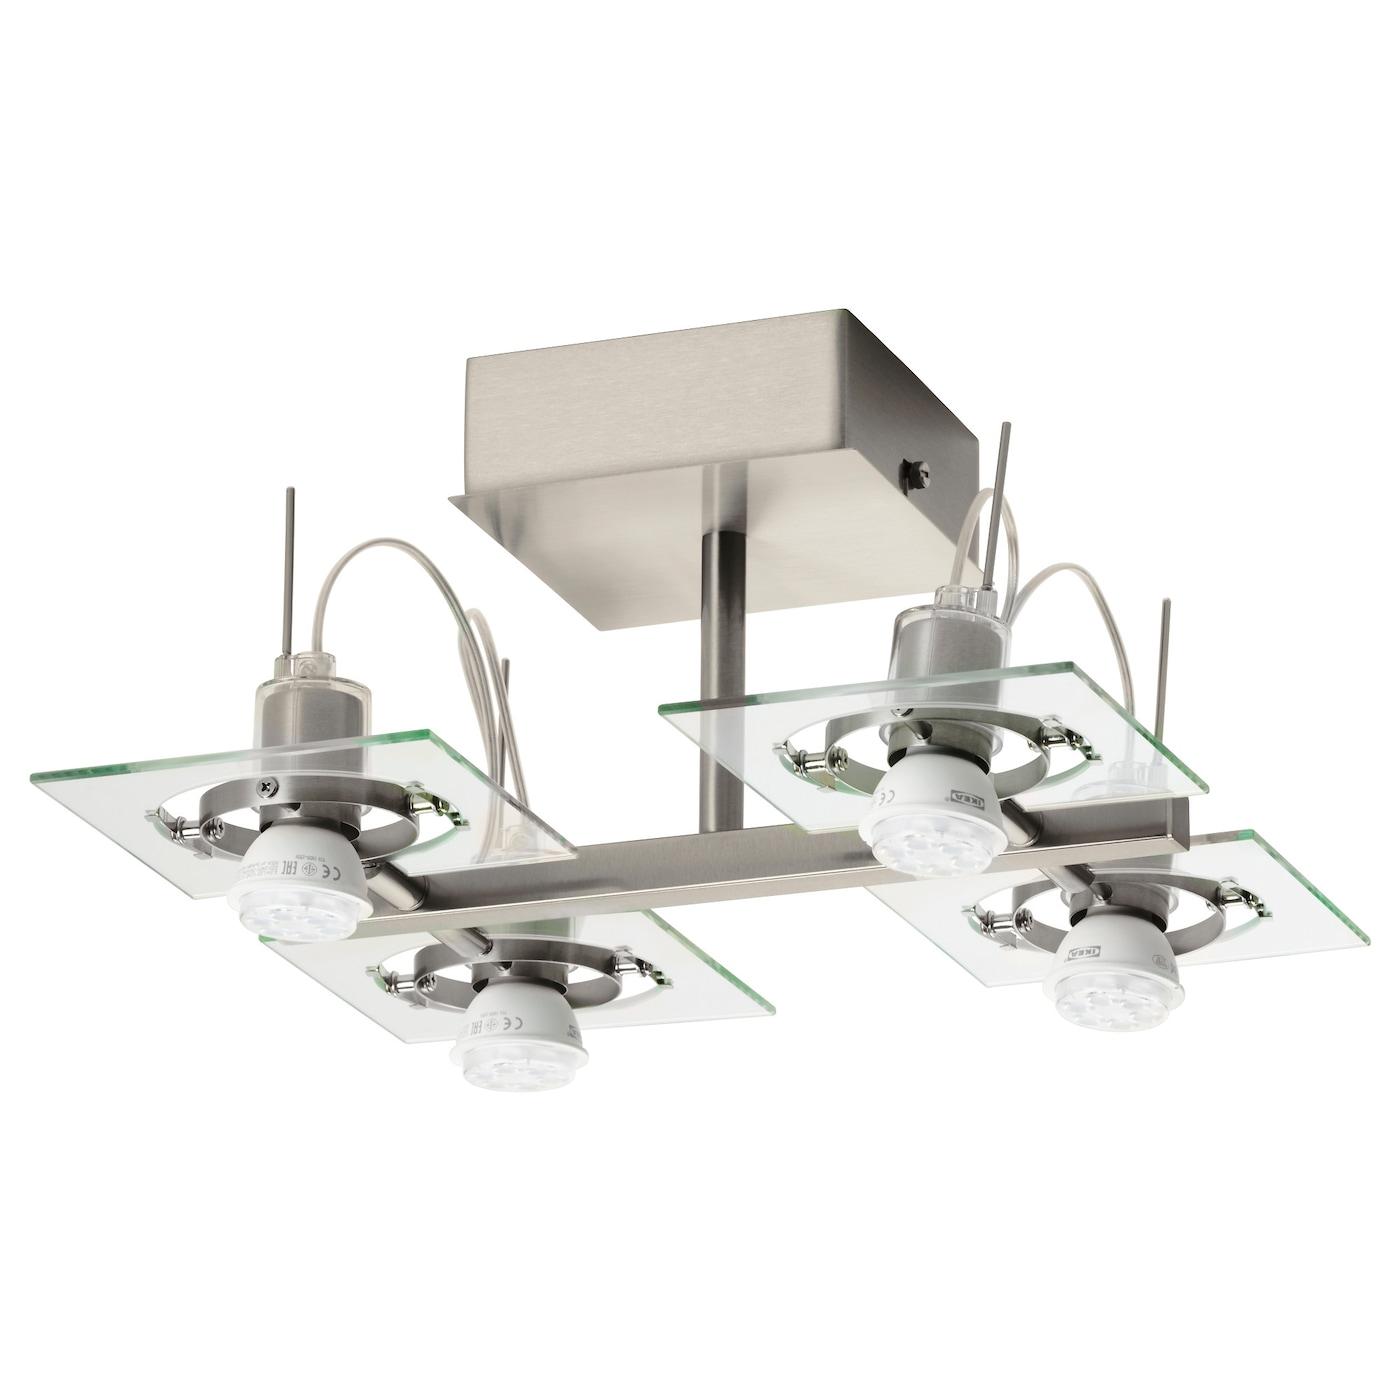 lighting spotlights ceiling. ikea fuga ceiling spotlight with 4 spots adjustable spotlights lighting o